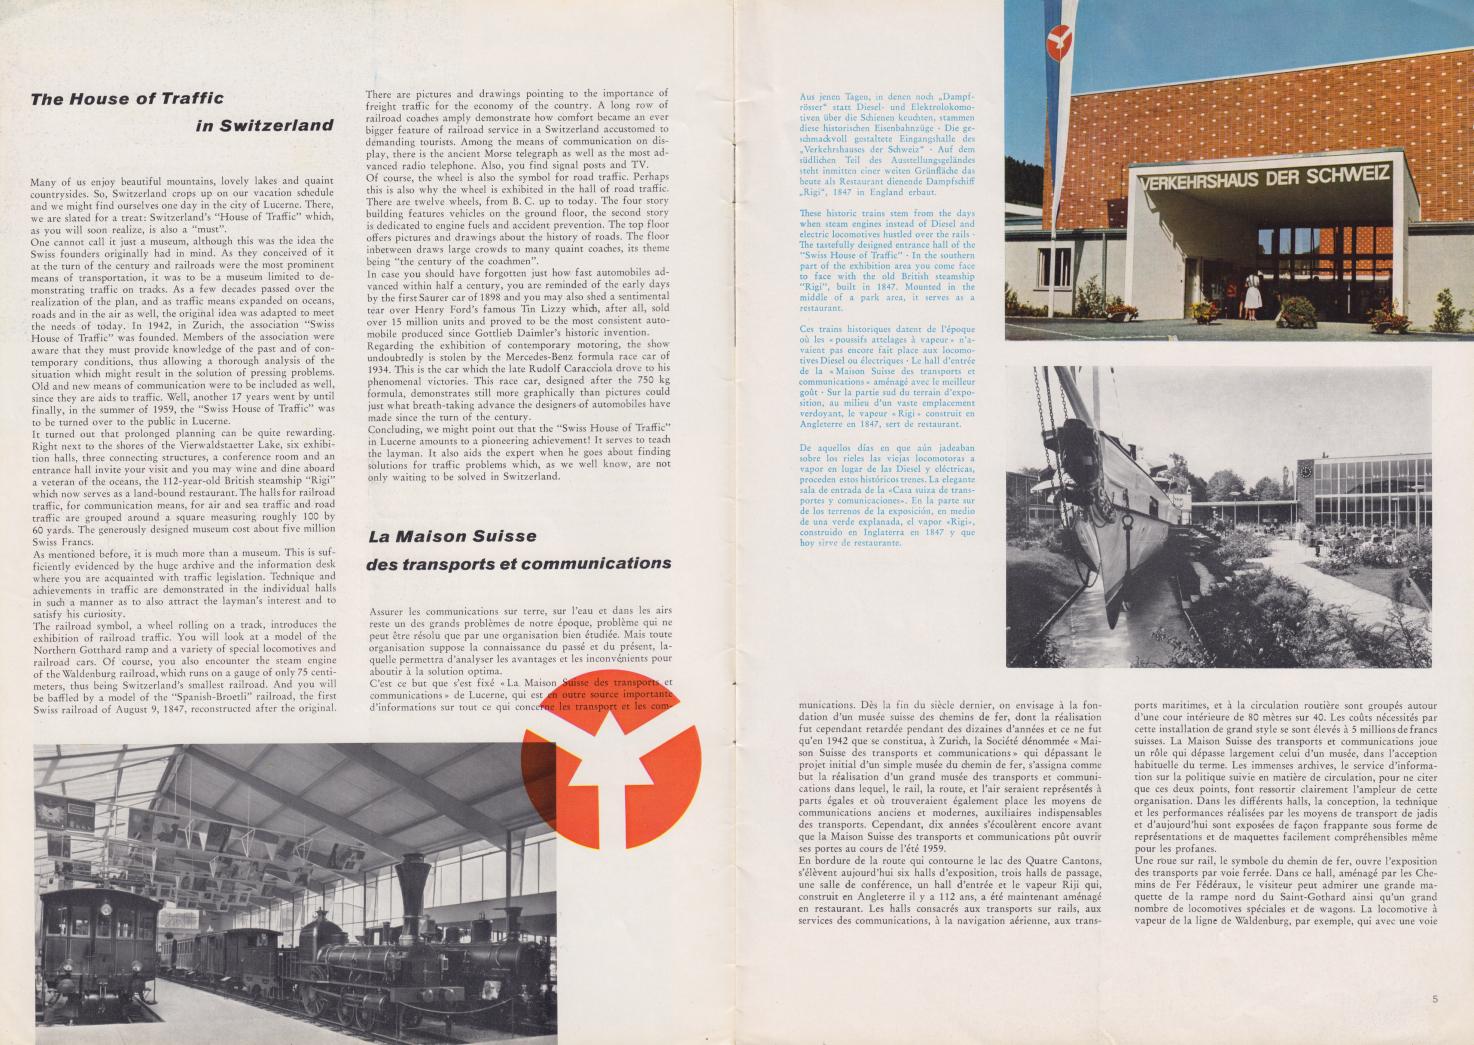 (REVISTA): Periódico In aller welt n.º 37 - Mercedes-Benz no mundo - 1959 - multilingue 003